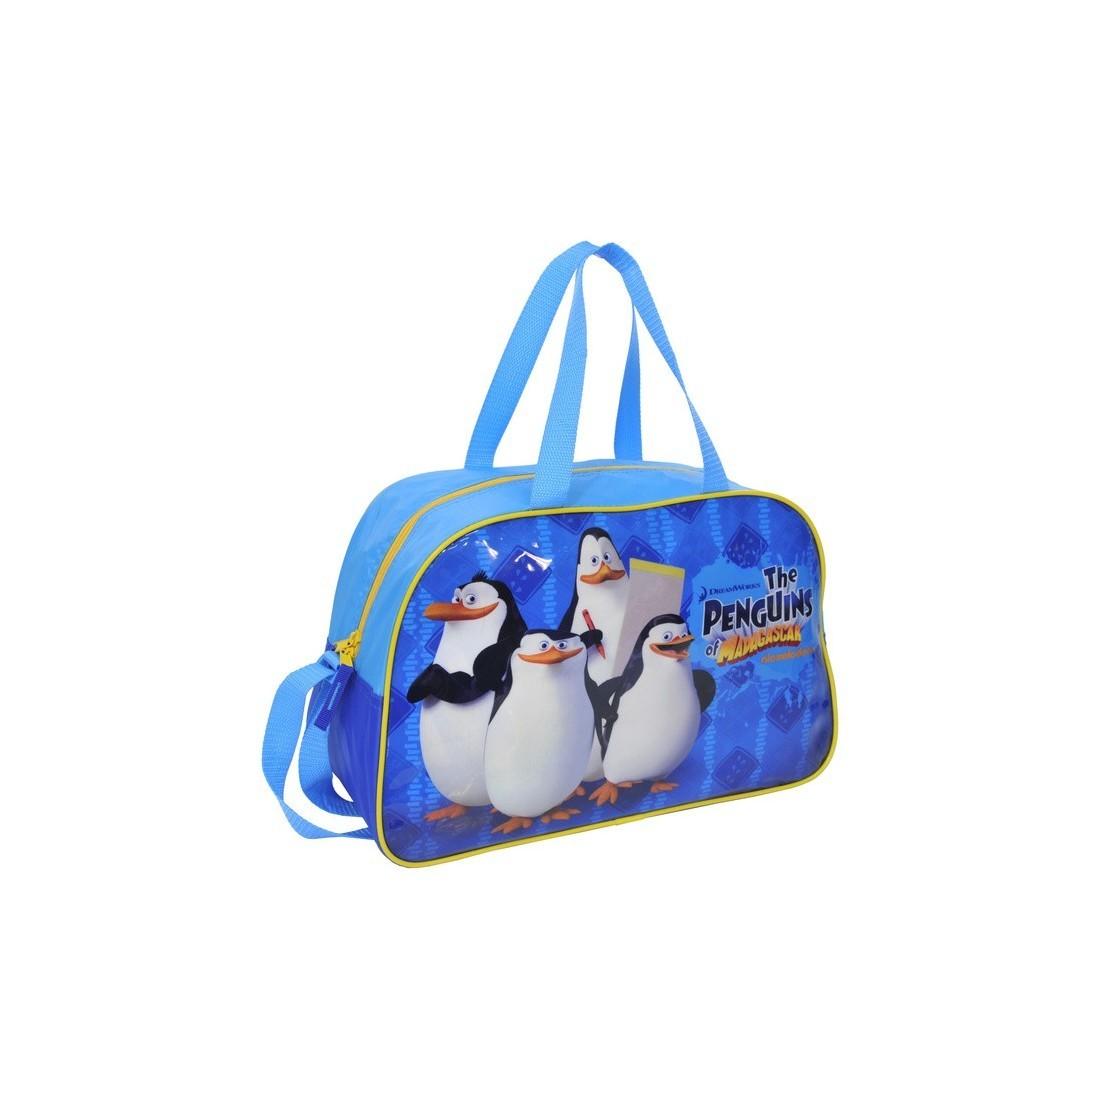 Torba sportowa Pingwiny z Madagaskaru niebieska - plecak-tornister.pl